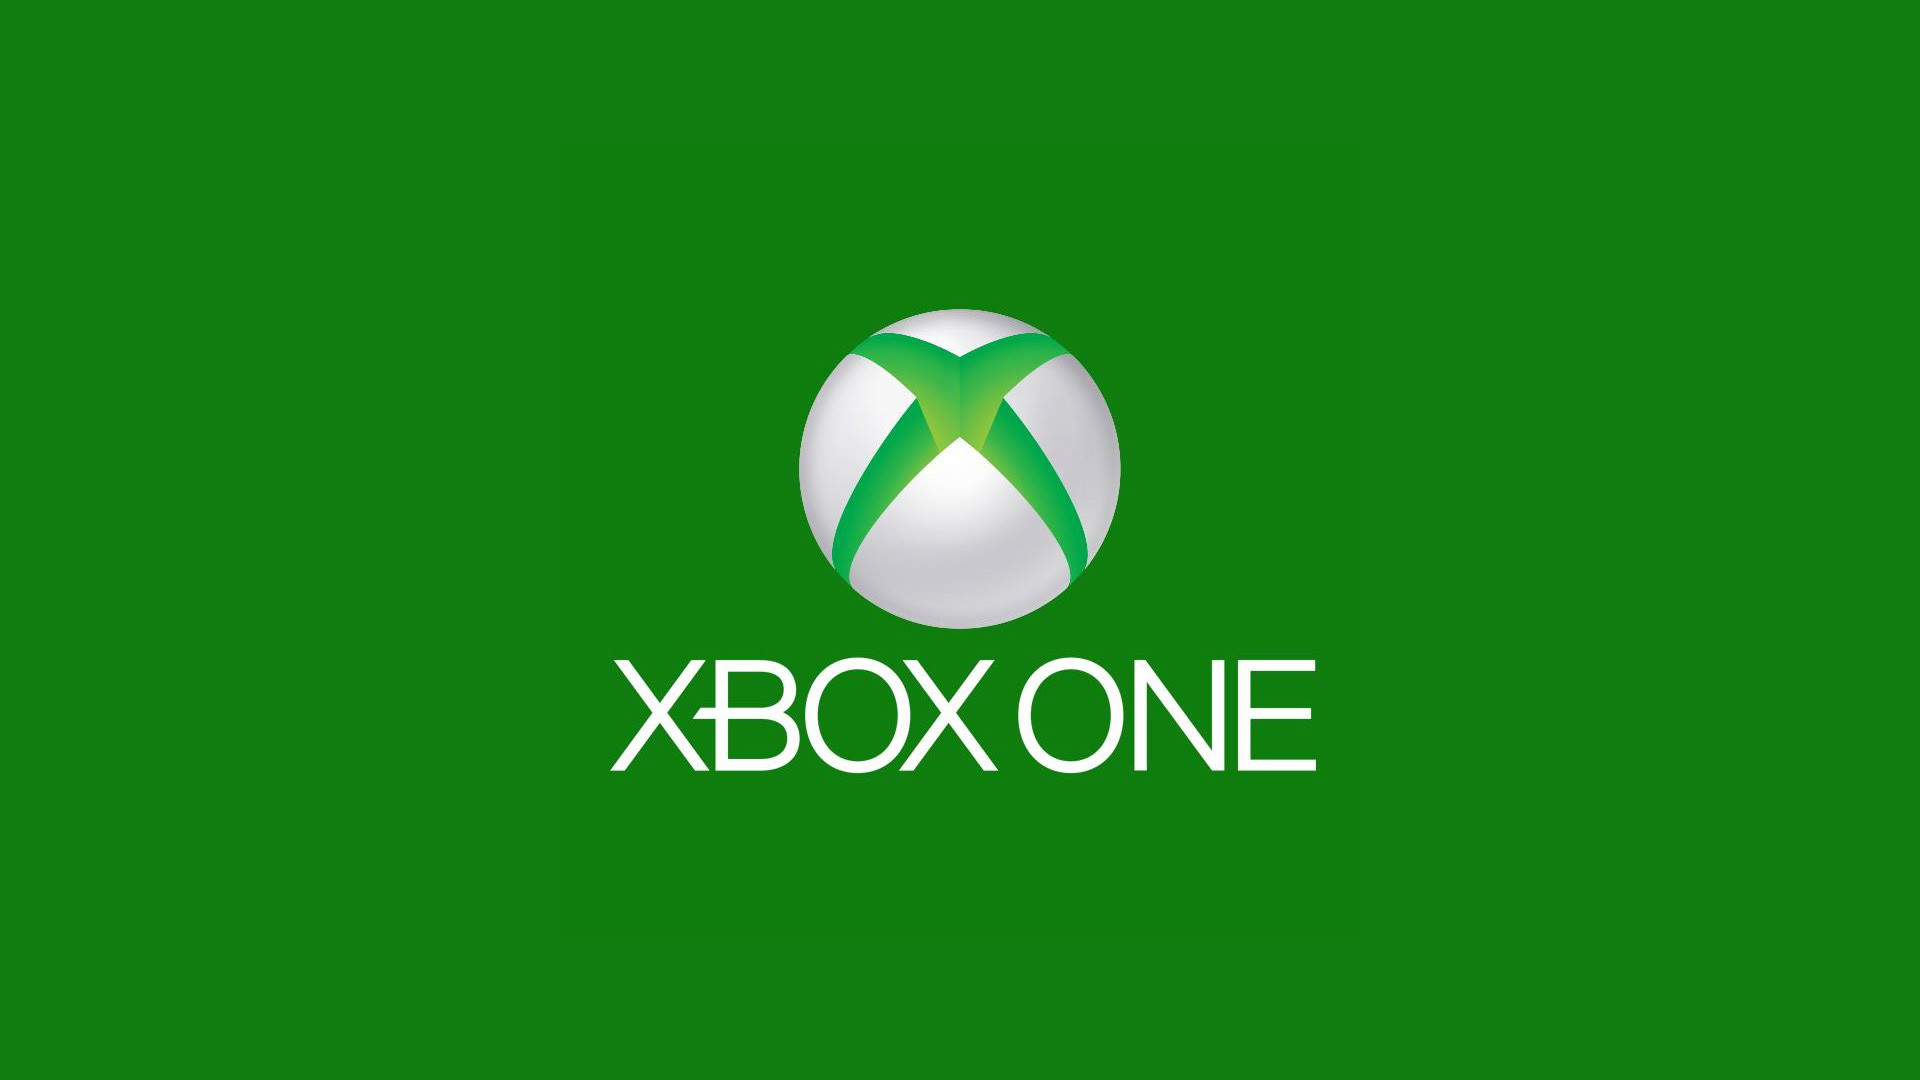 Xbox One Wallpaper | Free Xbox One | Microsoft | Gamers | free online games  | New Xbox one | bestscreenwallpaper.com | #1